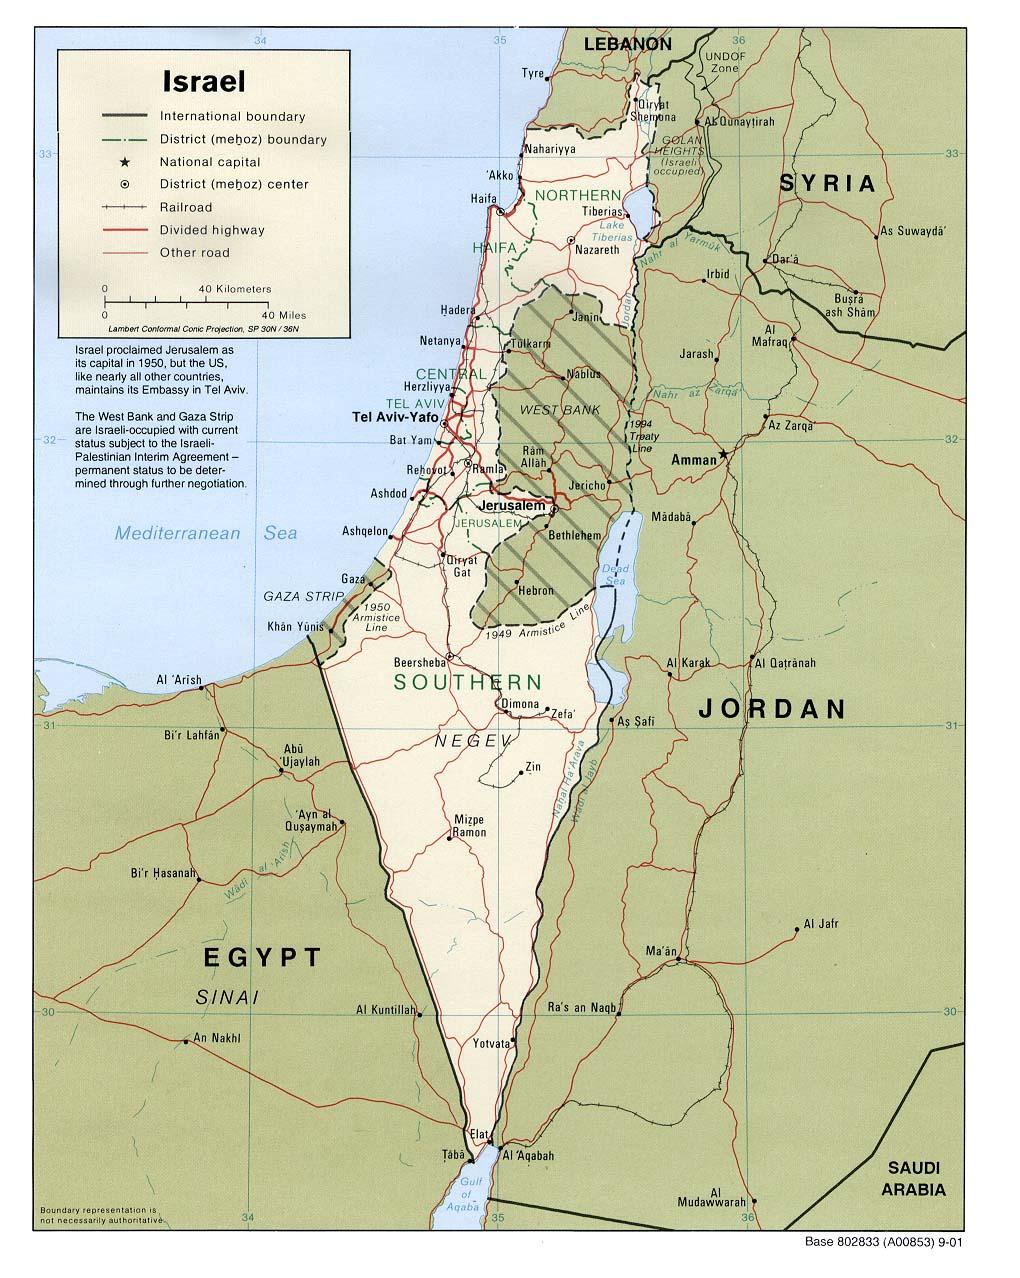 israel - photo #10